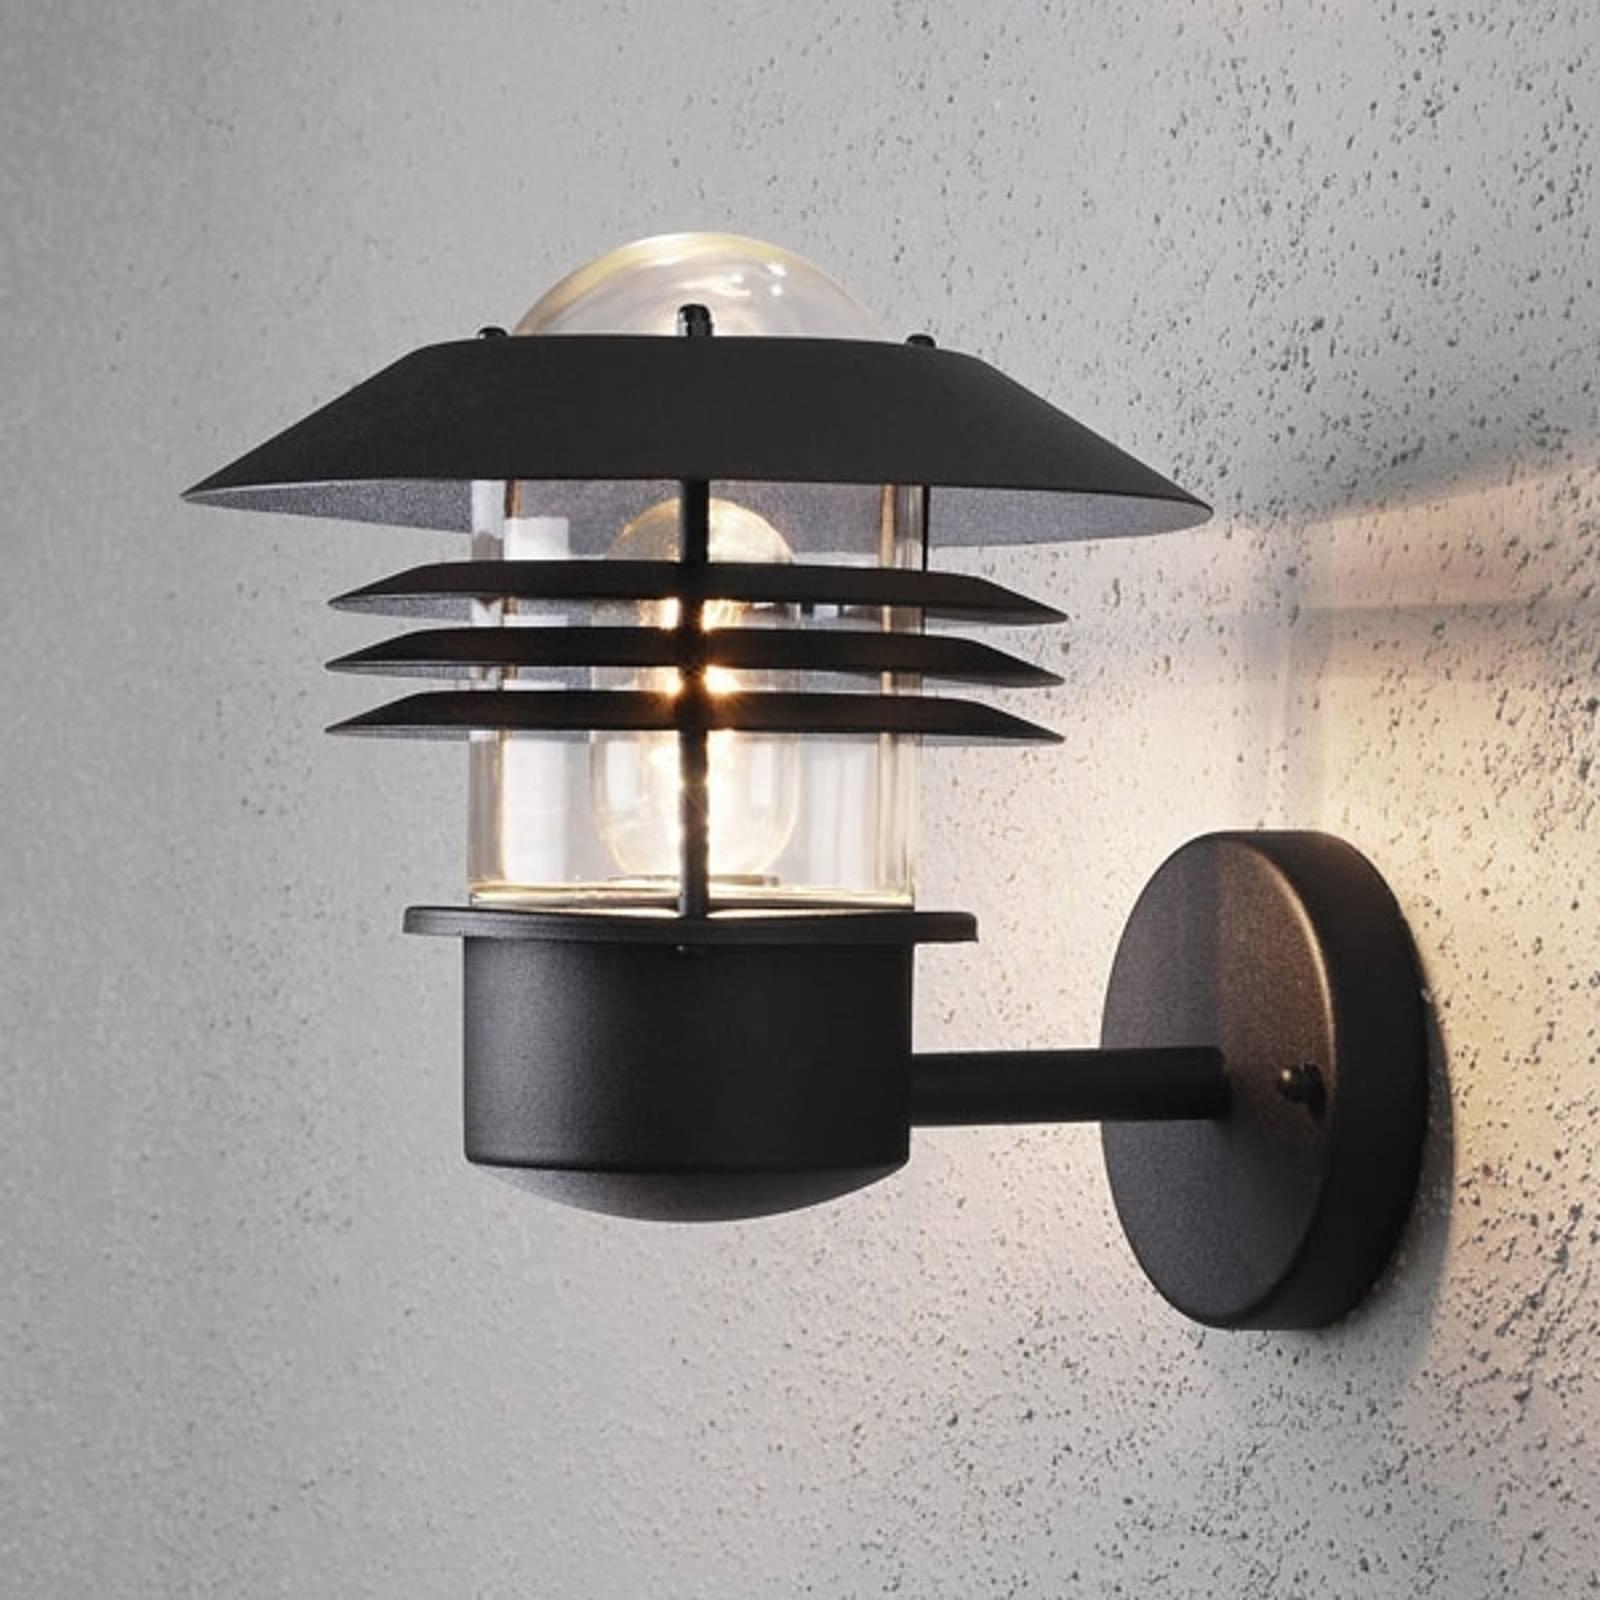 Buitenwandlamp New Modena, lantaarn, E27, zwart